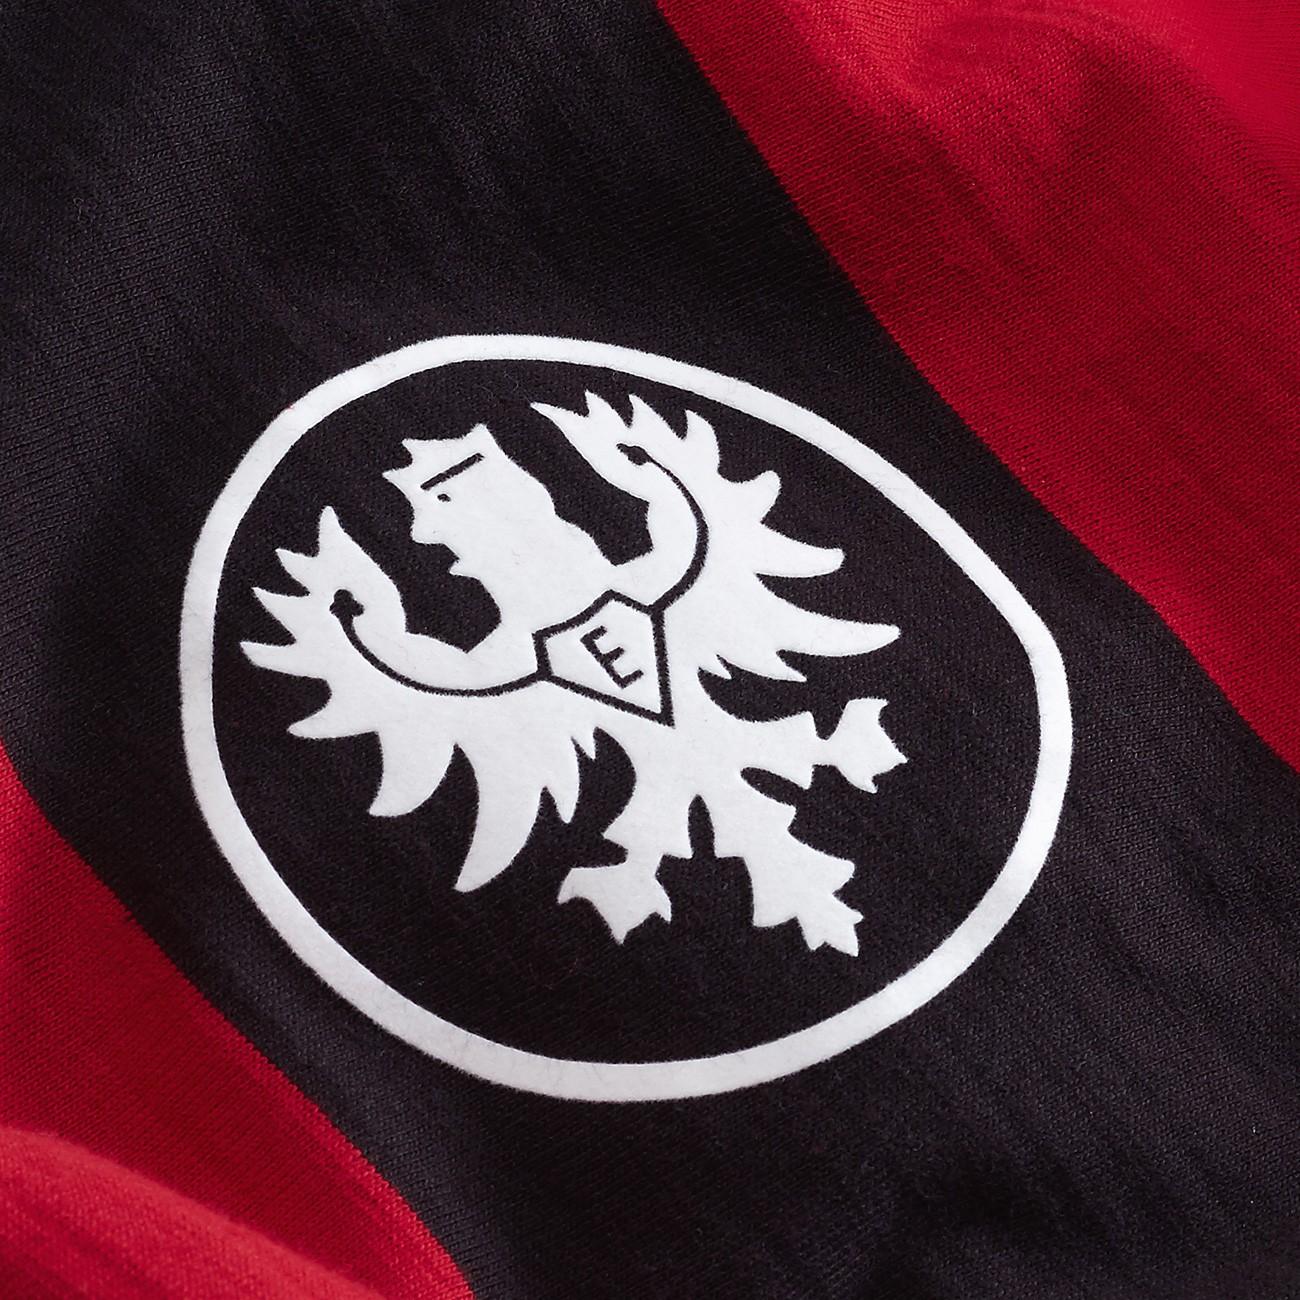 1d1d70a2c ... Camiseta Eintracht Frankfurt 1979-80. -15%